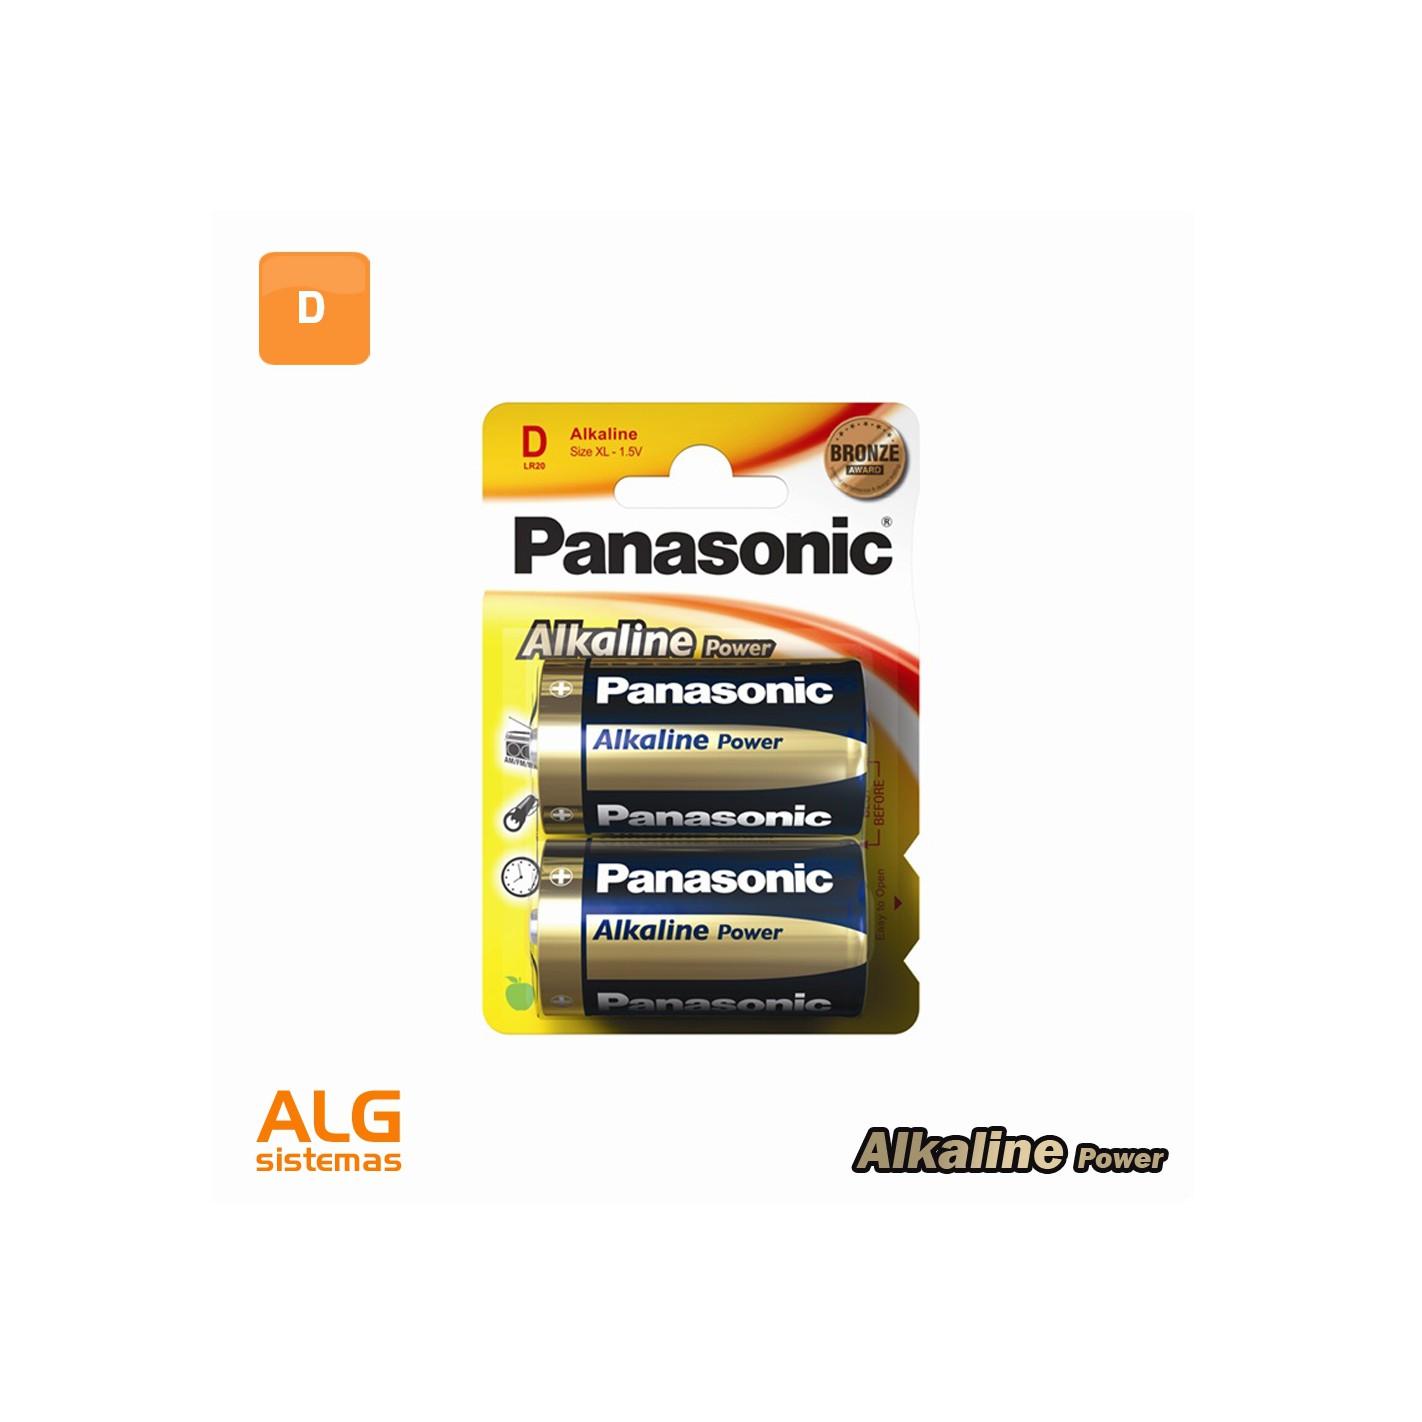 Extractor De Baño A Pilas:Pila Alcalina Panasonic Bronze LR20 (blister 2 pilas) – ALG SISTEMAS